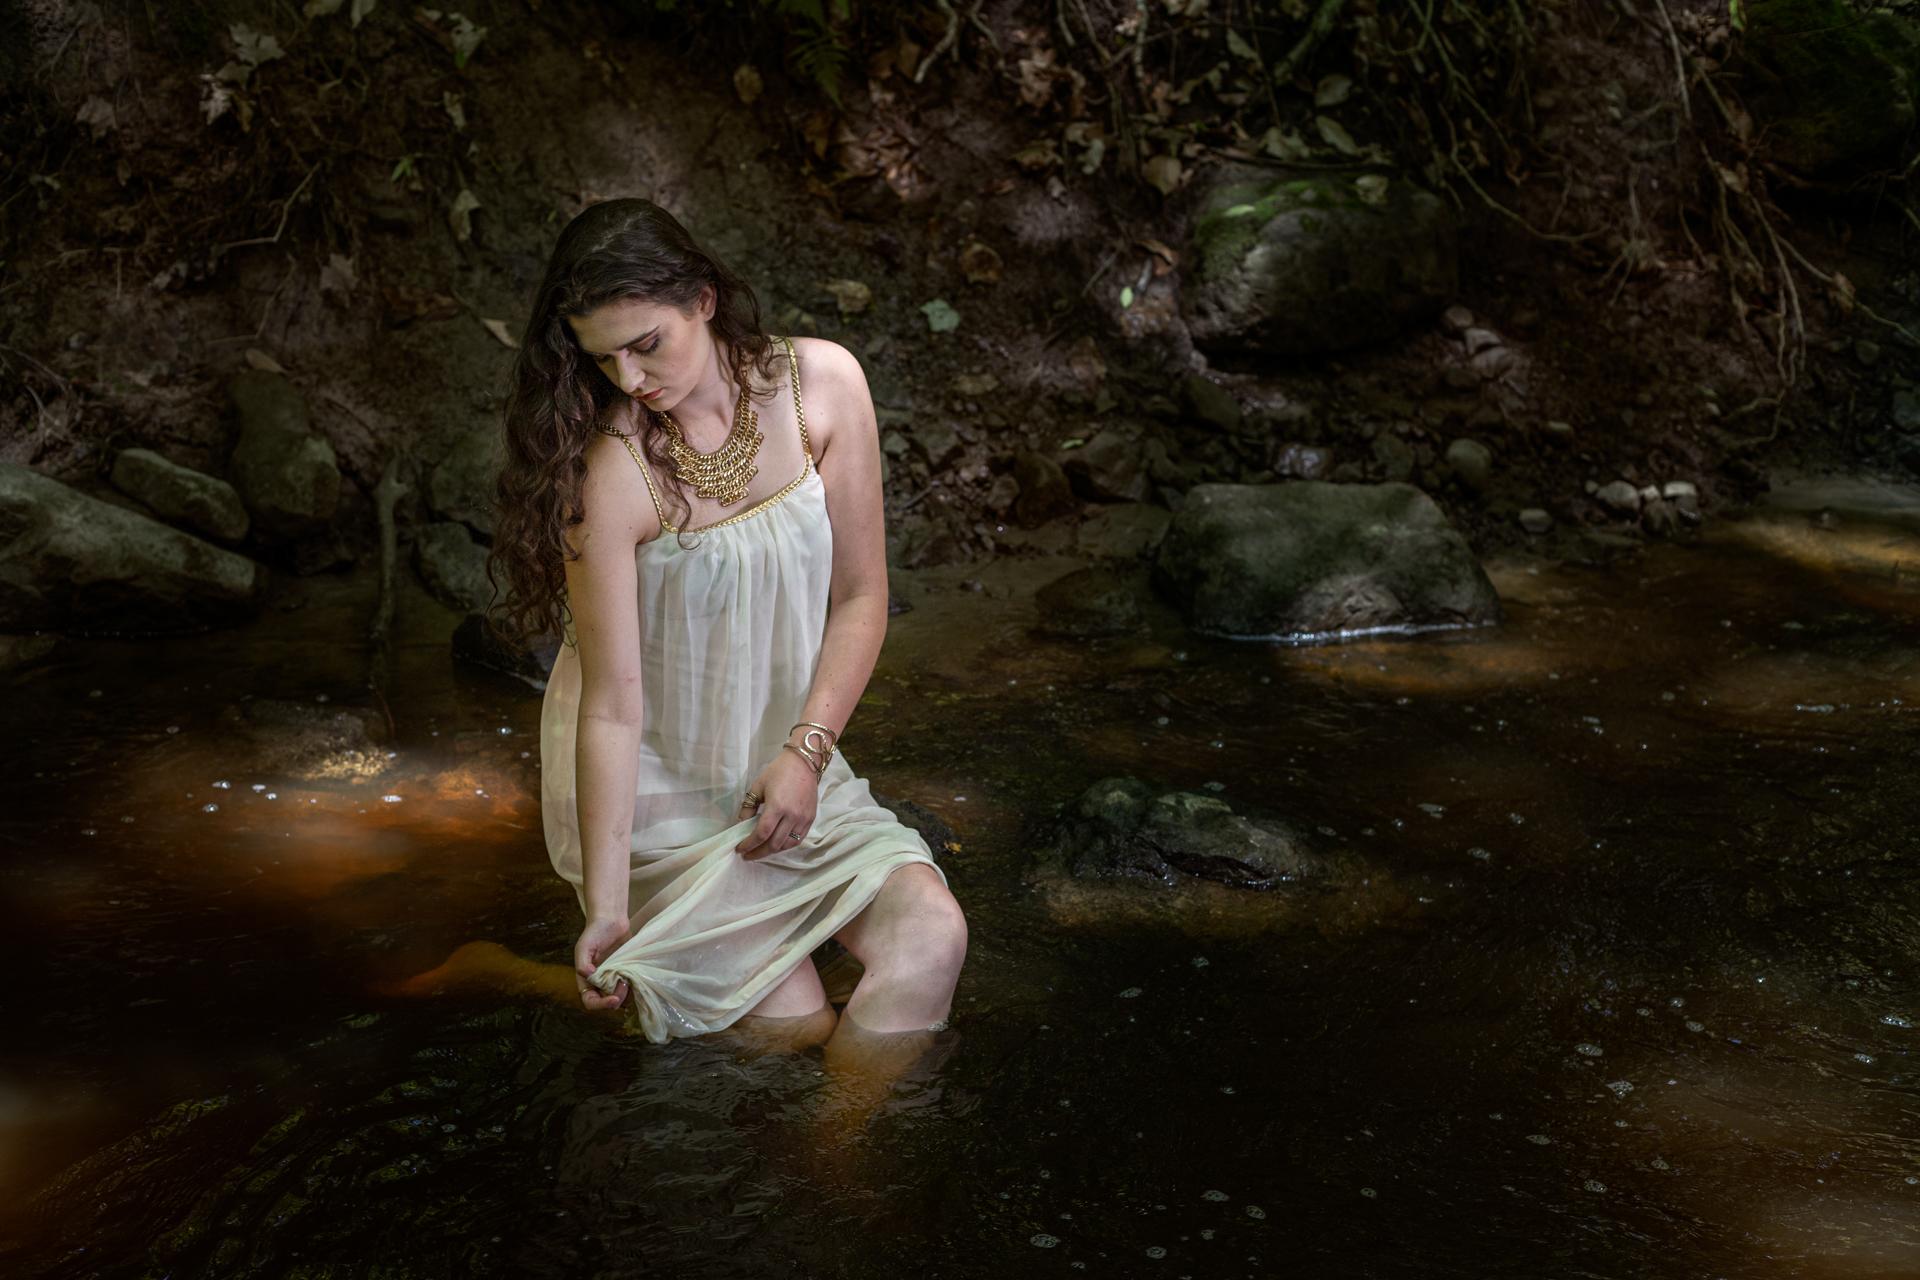 CFrenette-Marilyne-ruisseau-web-9